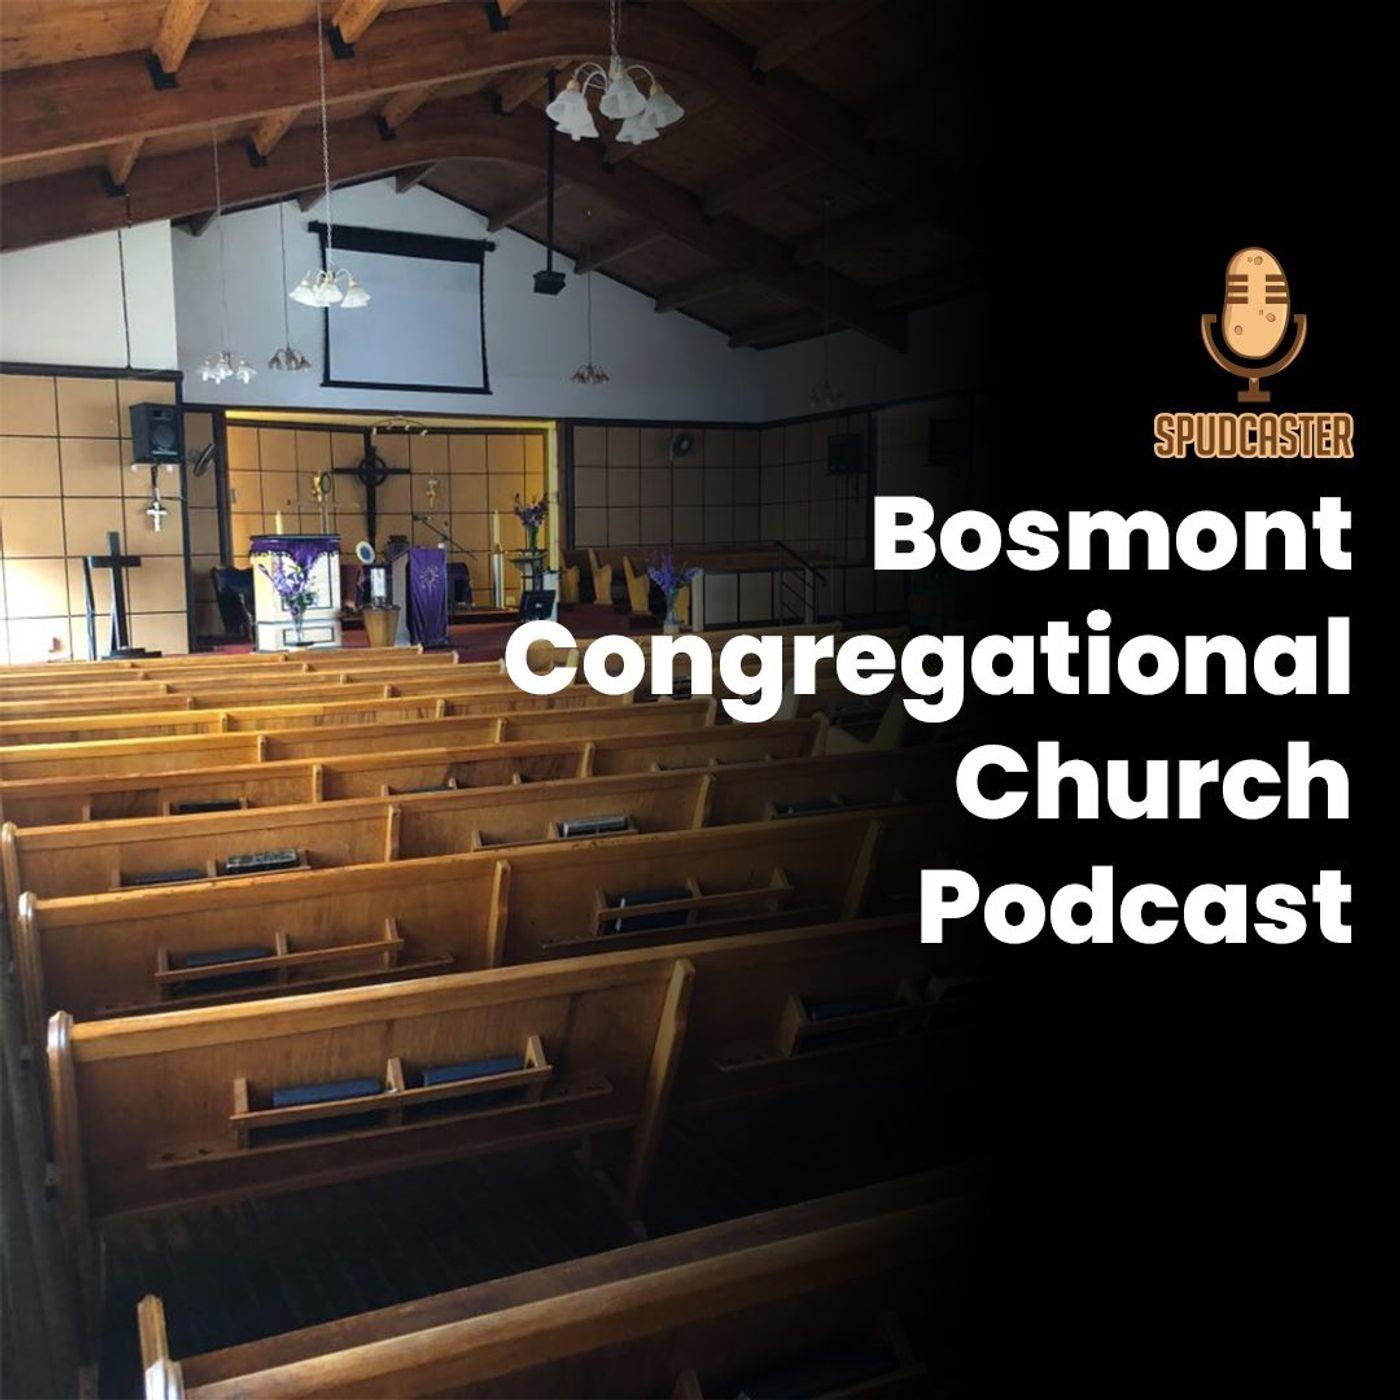 Bosmont Congregational Church Podcast